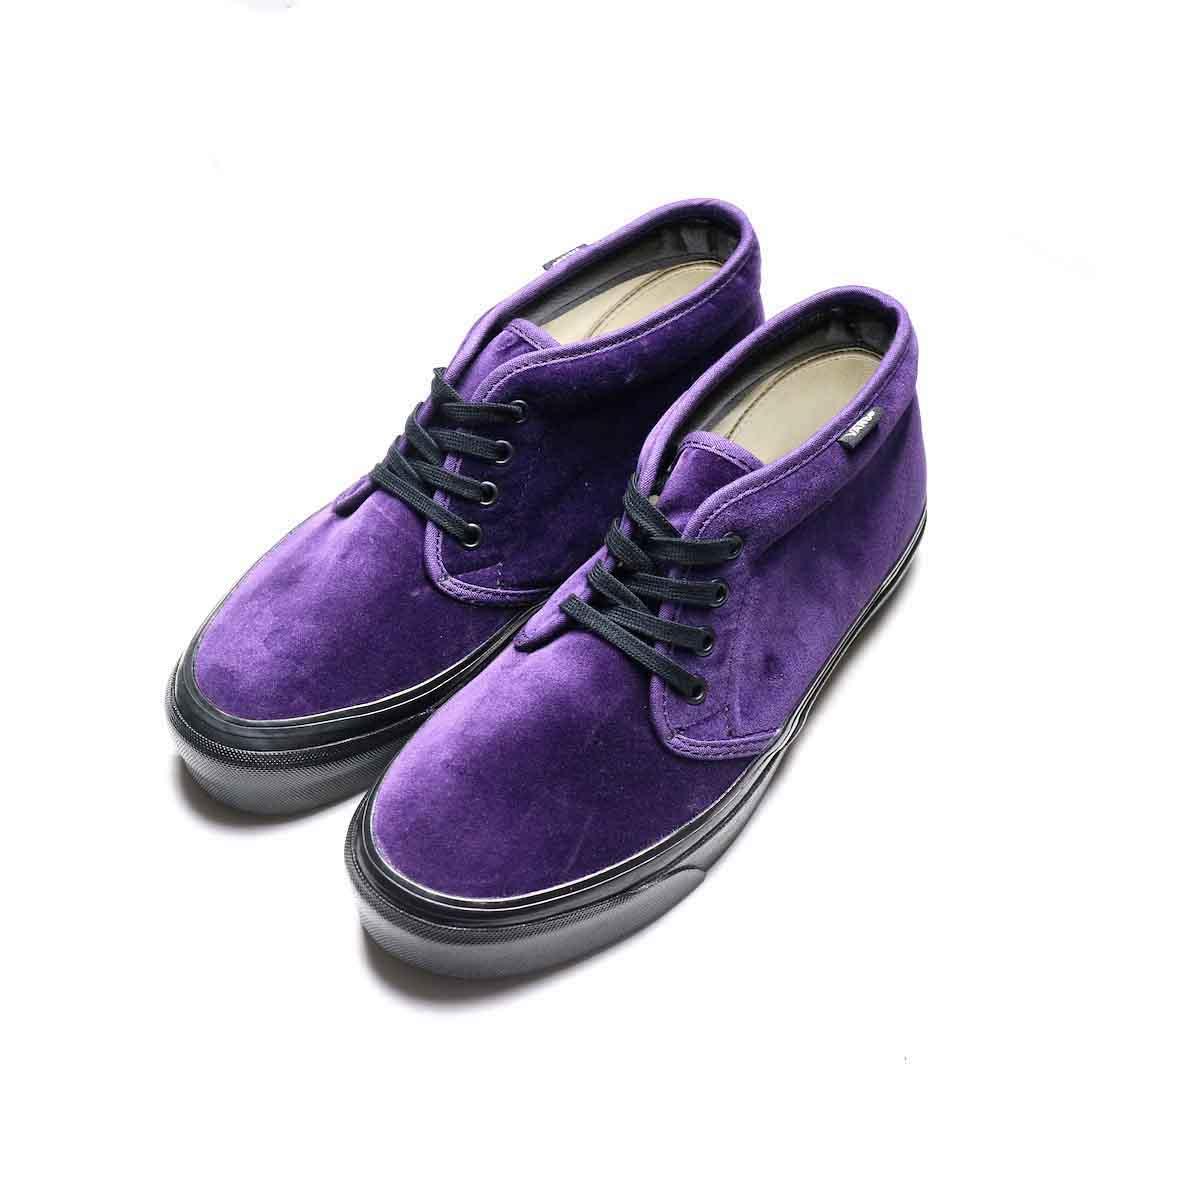 VANS / CHUKKA 49 DX (ANAHEIM FACTORY) (Purple VELVET)TOP